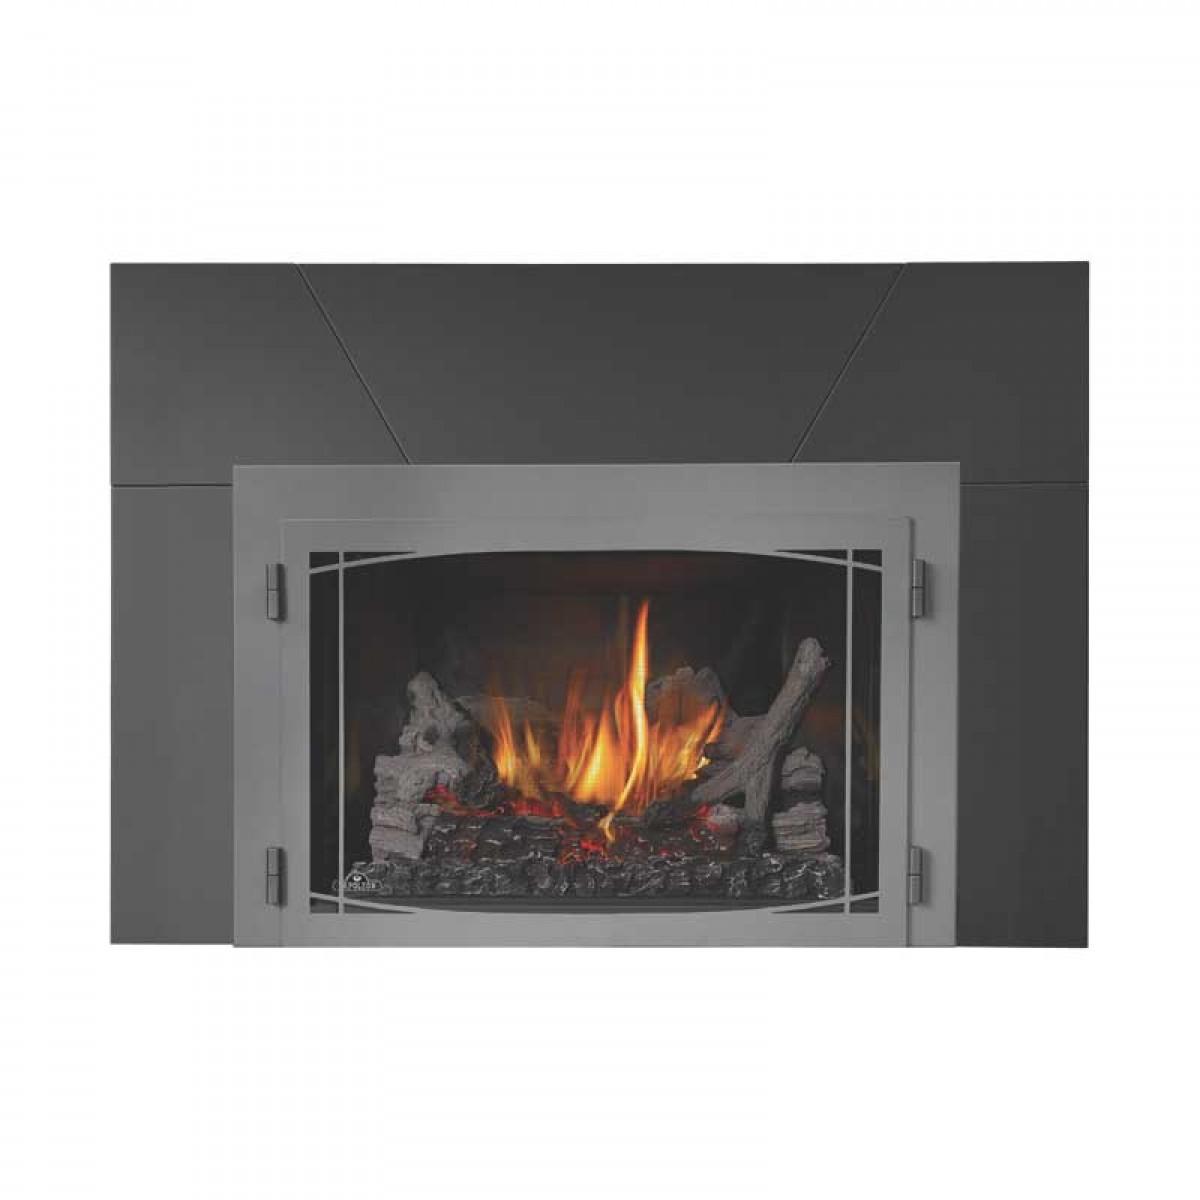 Napoleon Xir3nsbdeluxe Natural Gas Fireplace Insert At